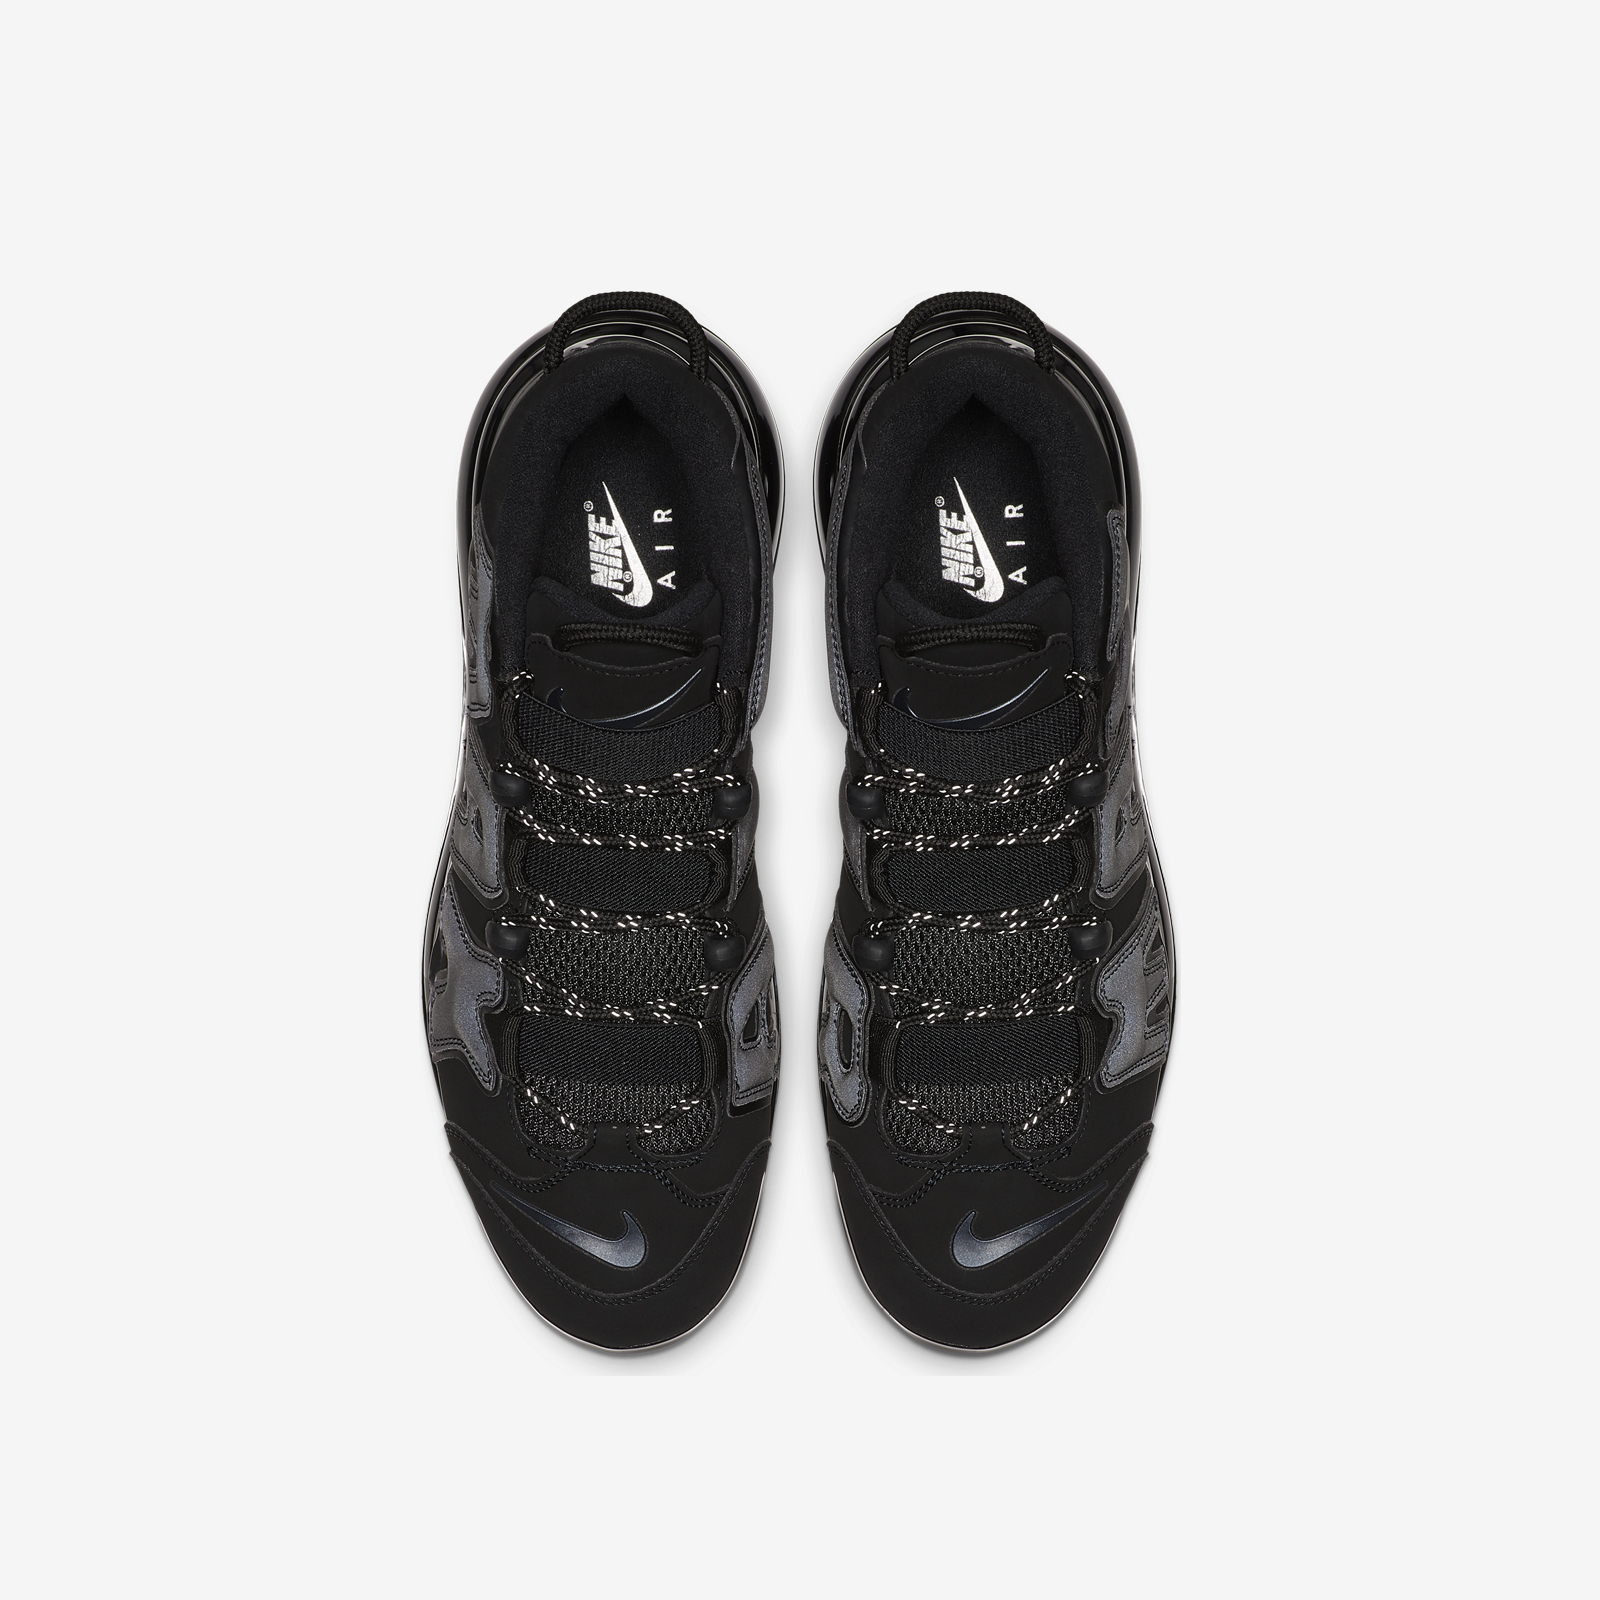 pretty nice e1a04 36723 Nike Sportswear Air More Uptempo 720 QS - 6. Close